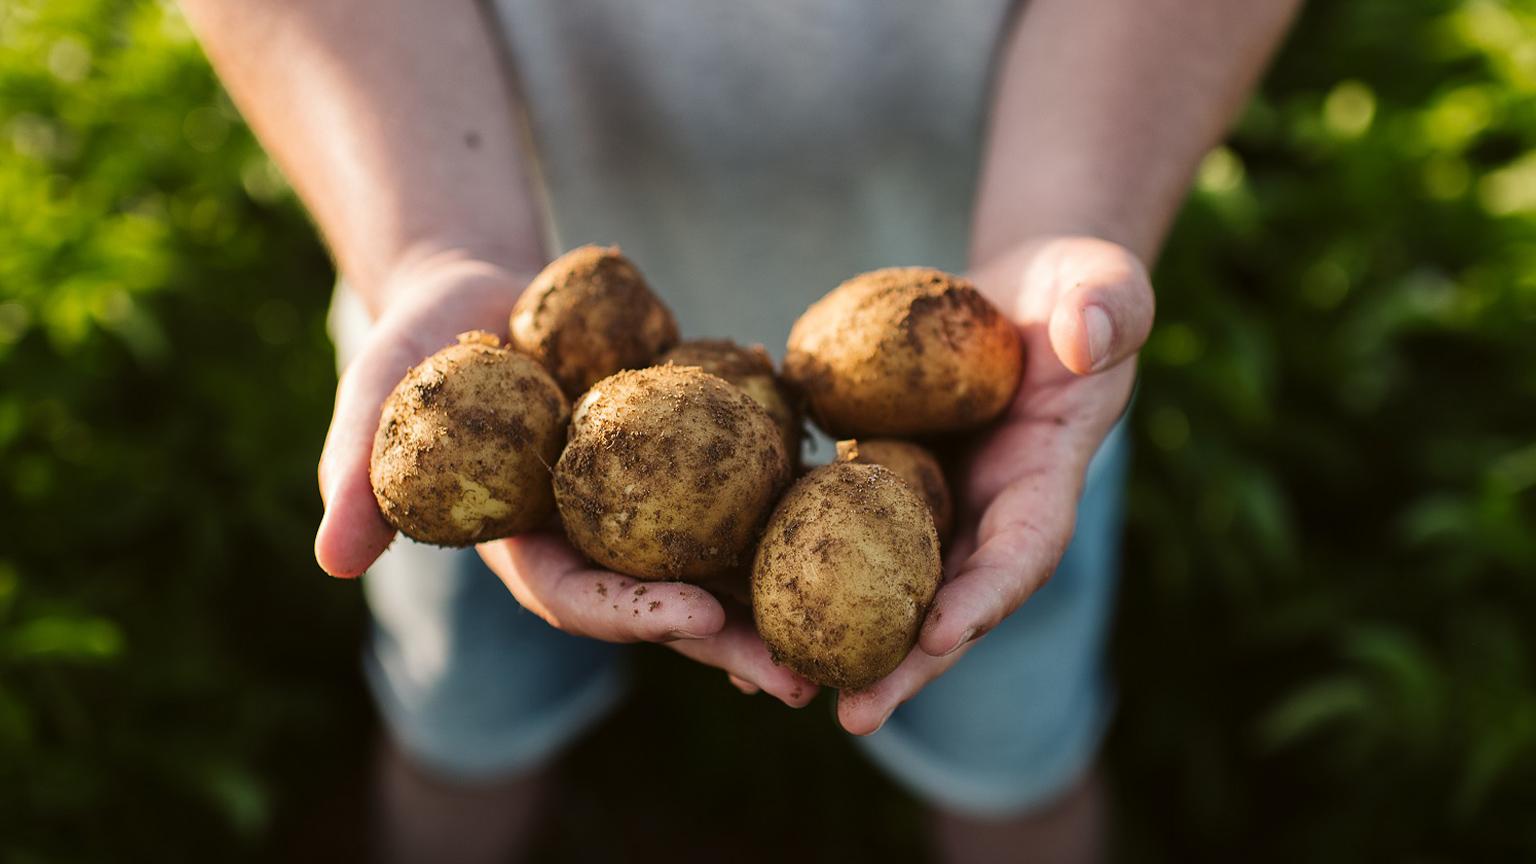 Nachhaltiges Nahrungsmittelsystem